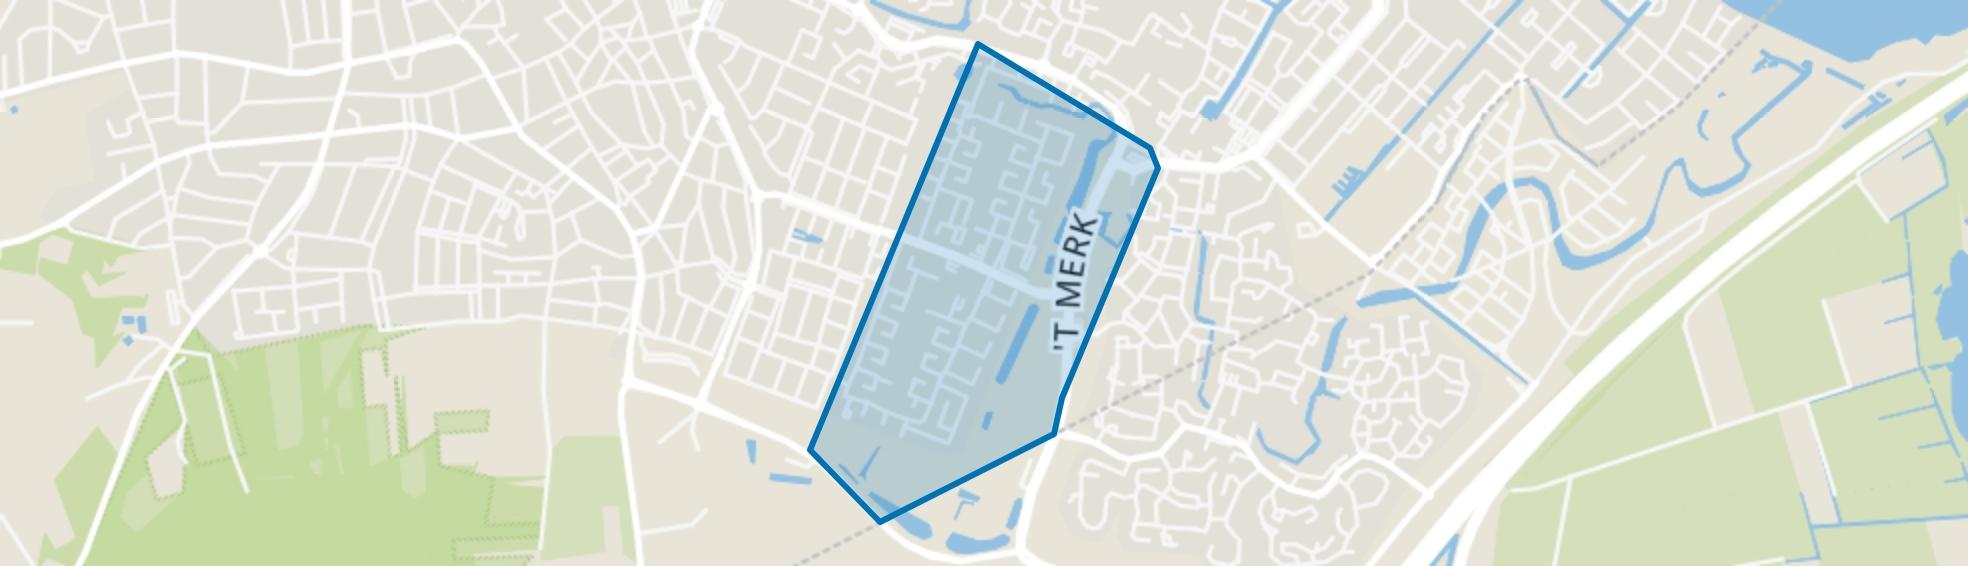 Stad en Lande, Huizen map